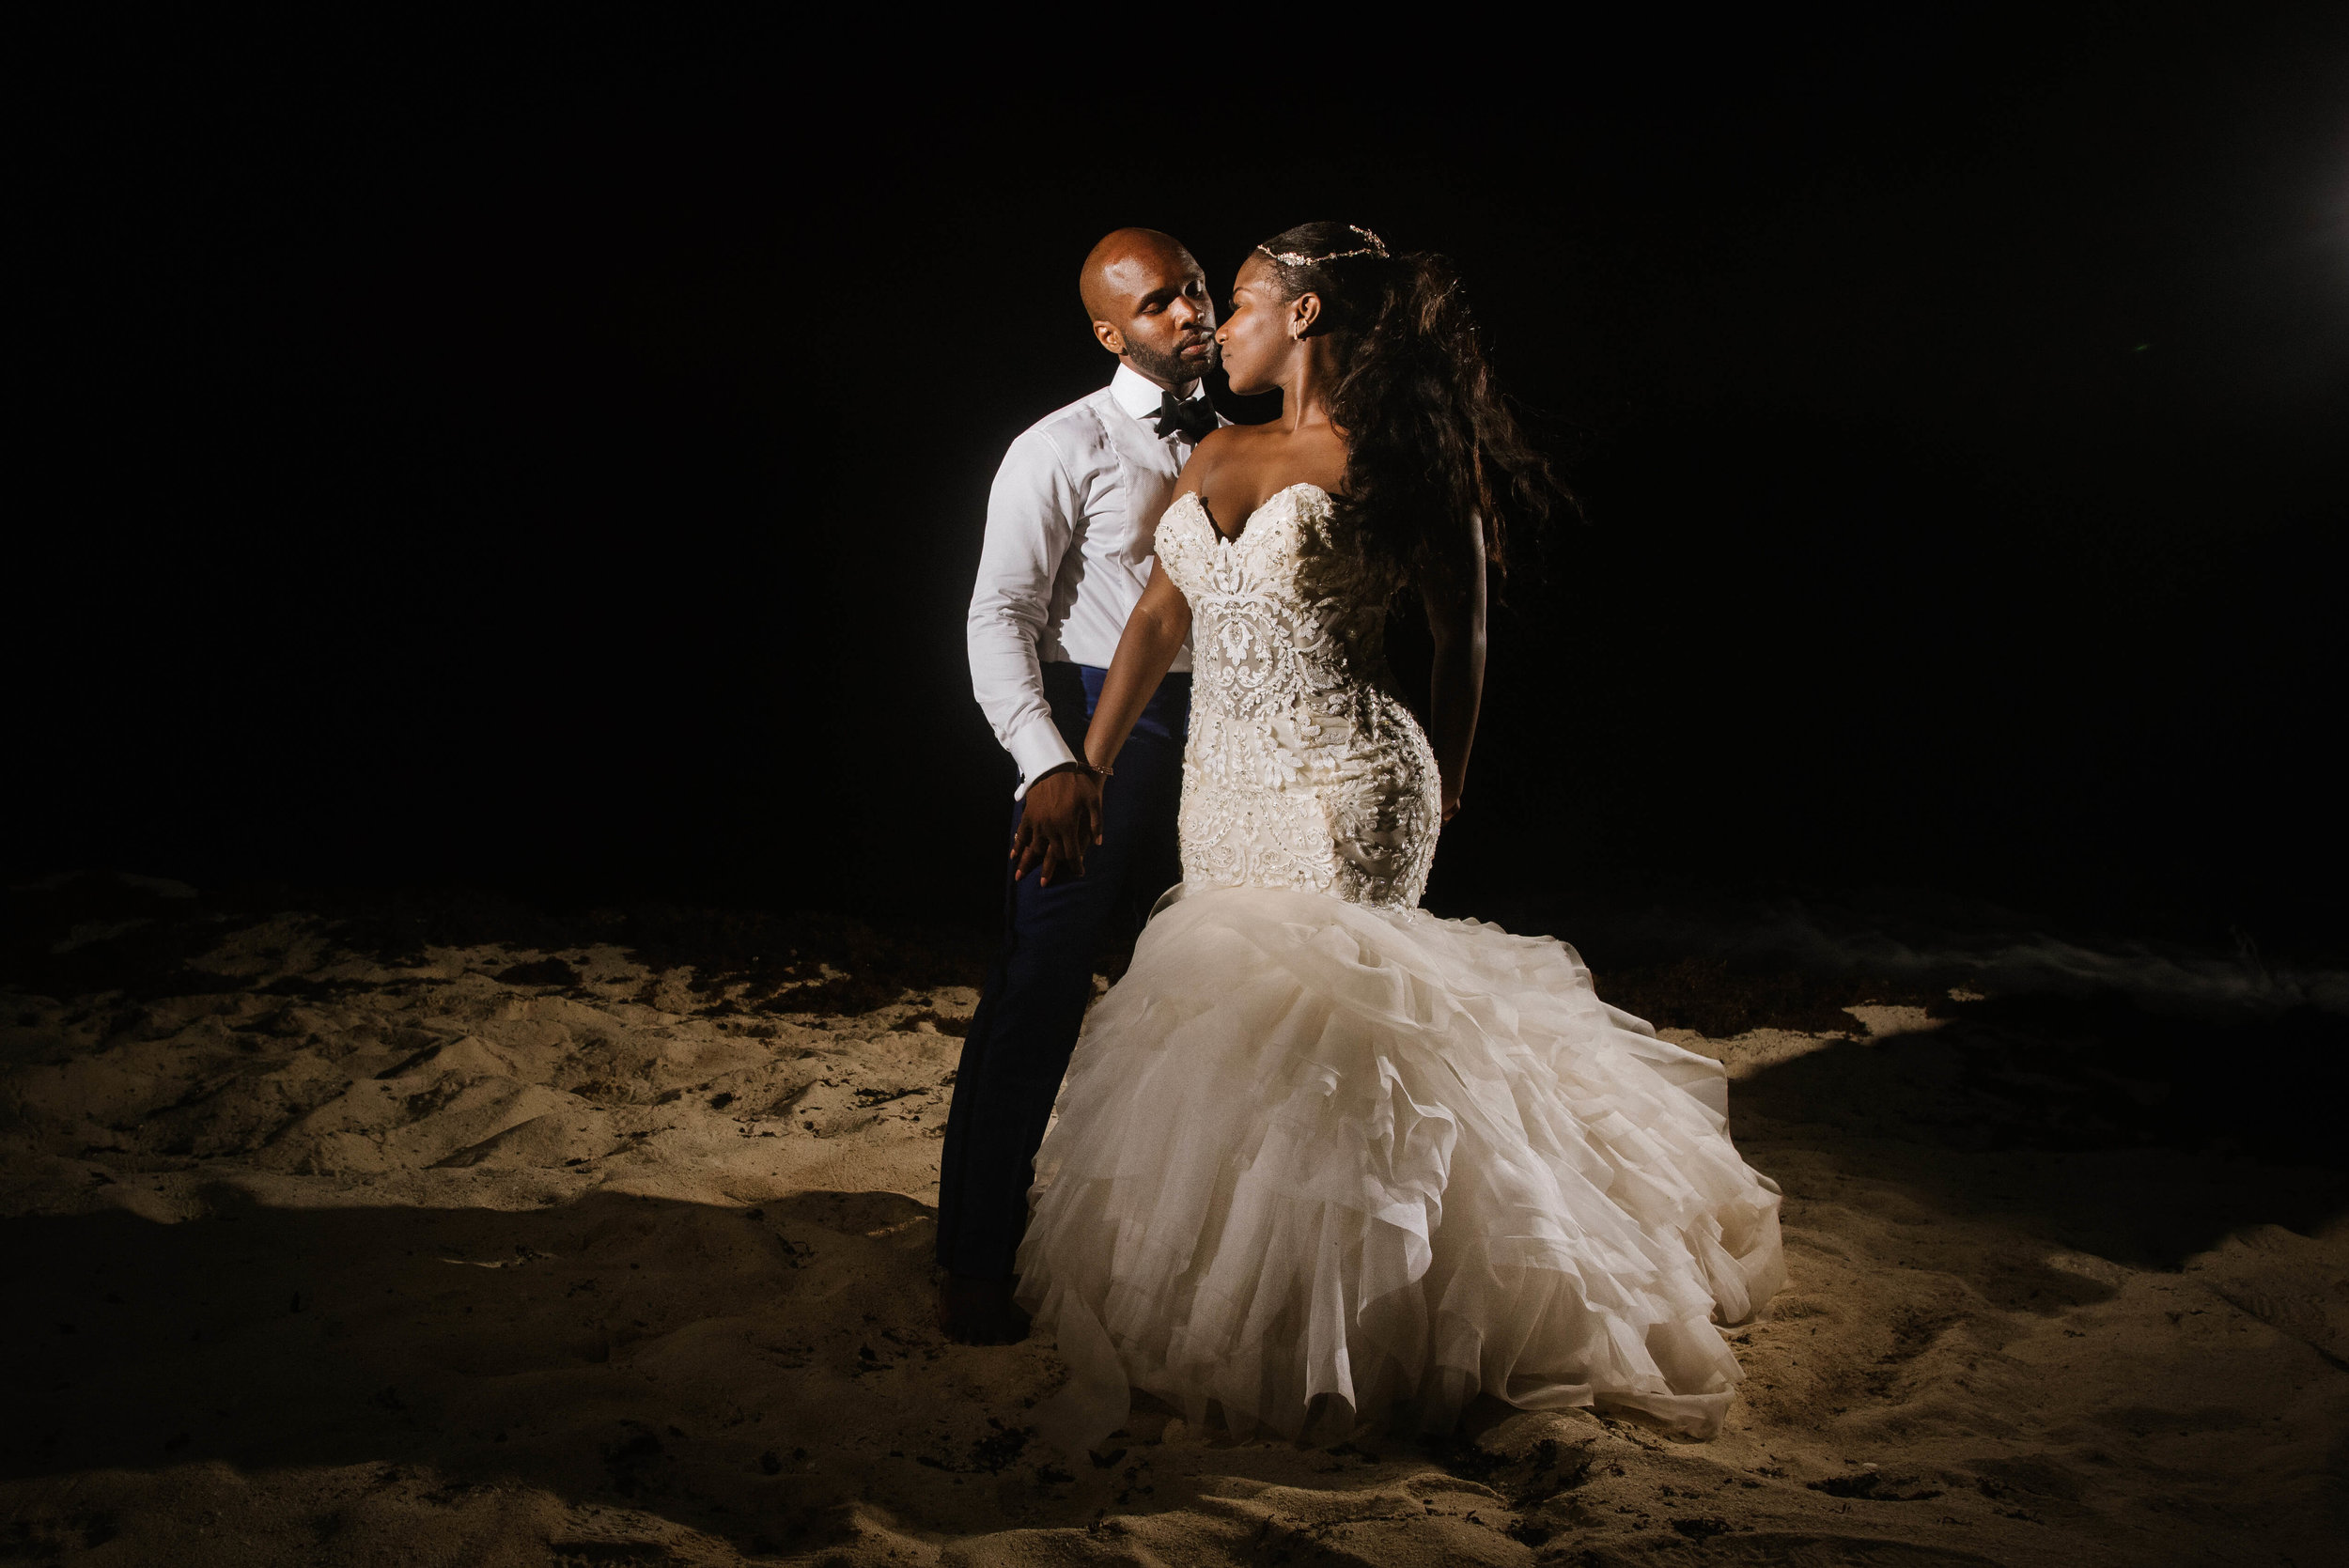 destiland-desti-sweating-for-the-destination-wedding-ready-workouts-2019-core-1.jpg